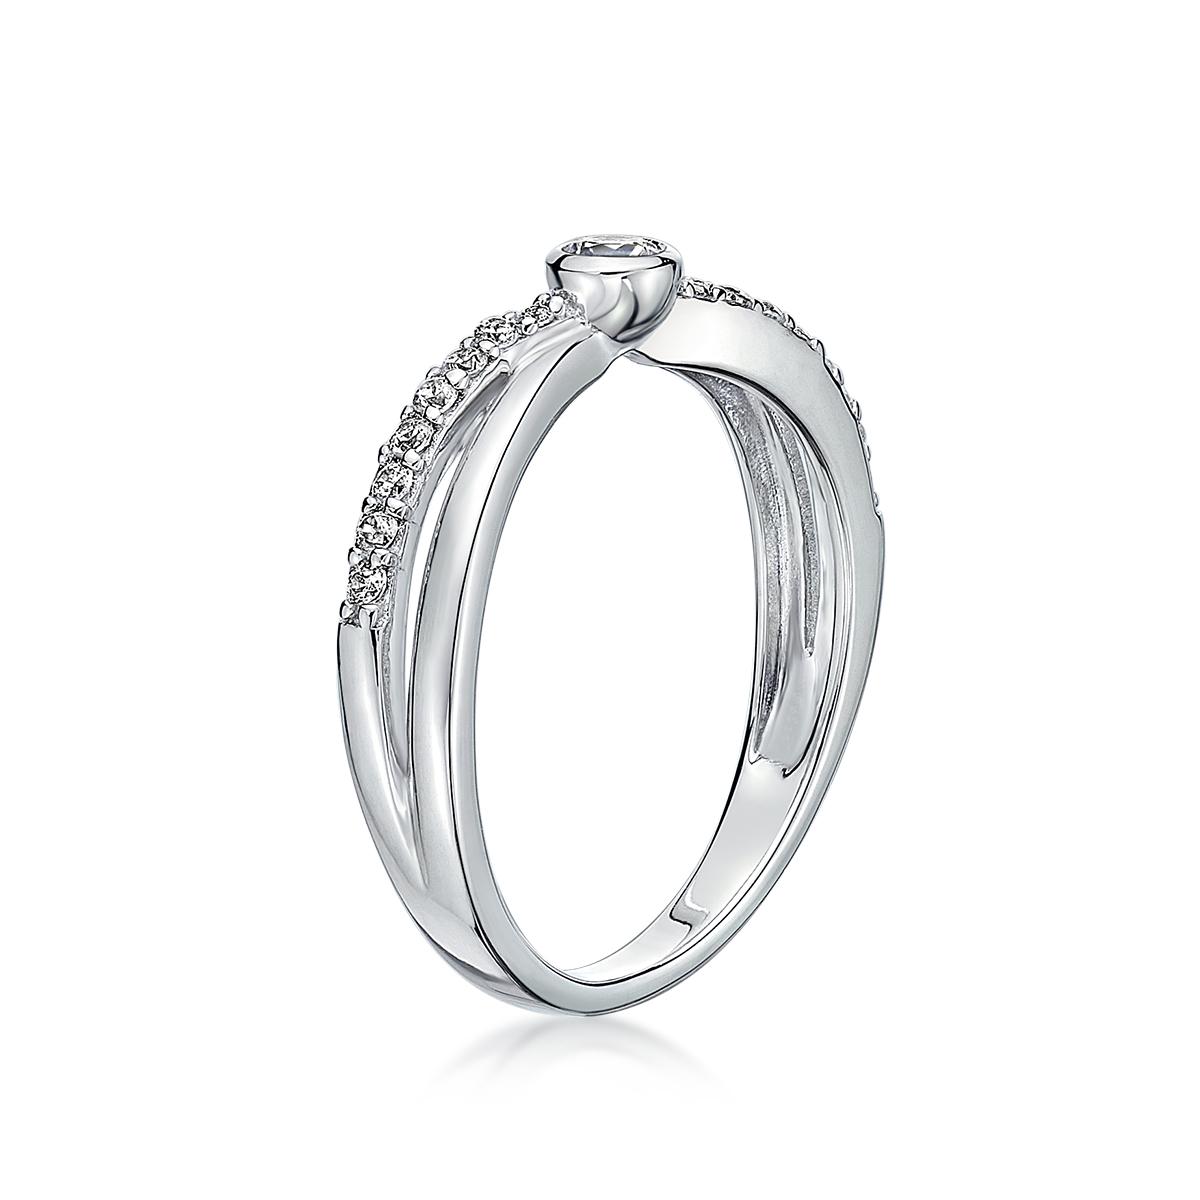 KSW204 璀璨軌跡-交叉雙線奢華戒指